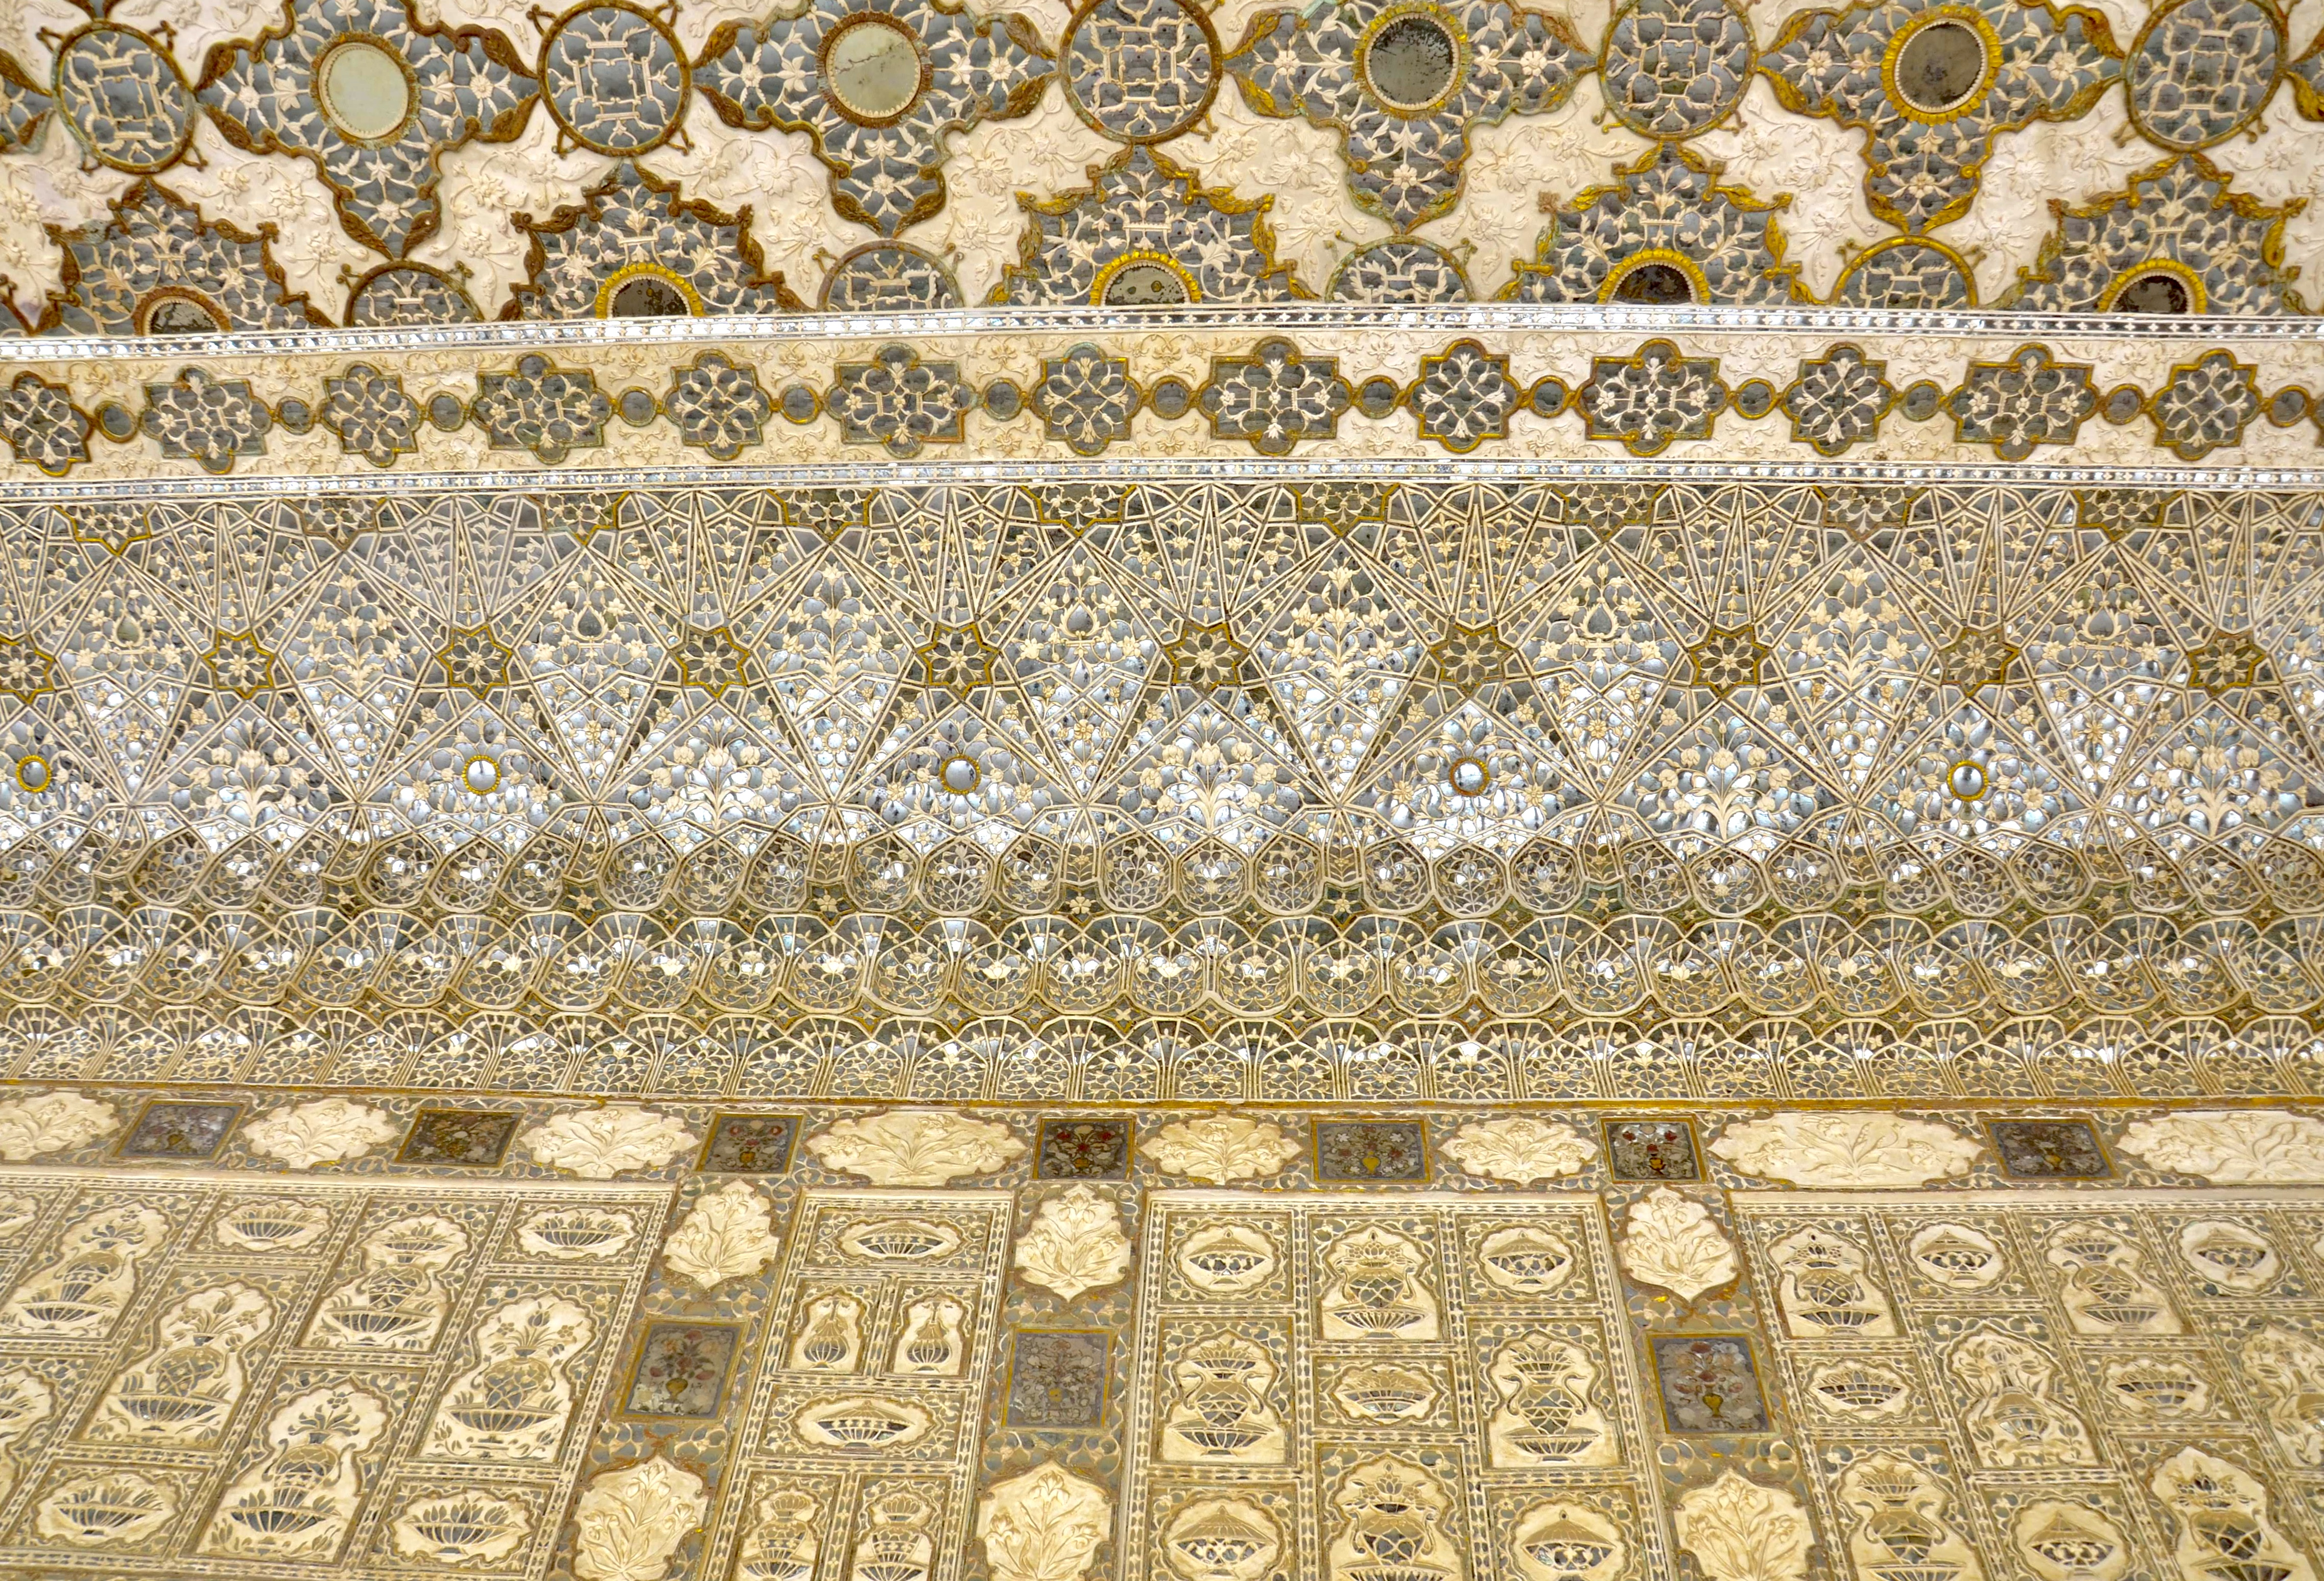 Palácio dos espelhos na Índia